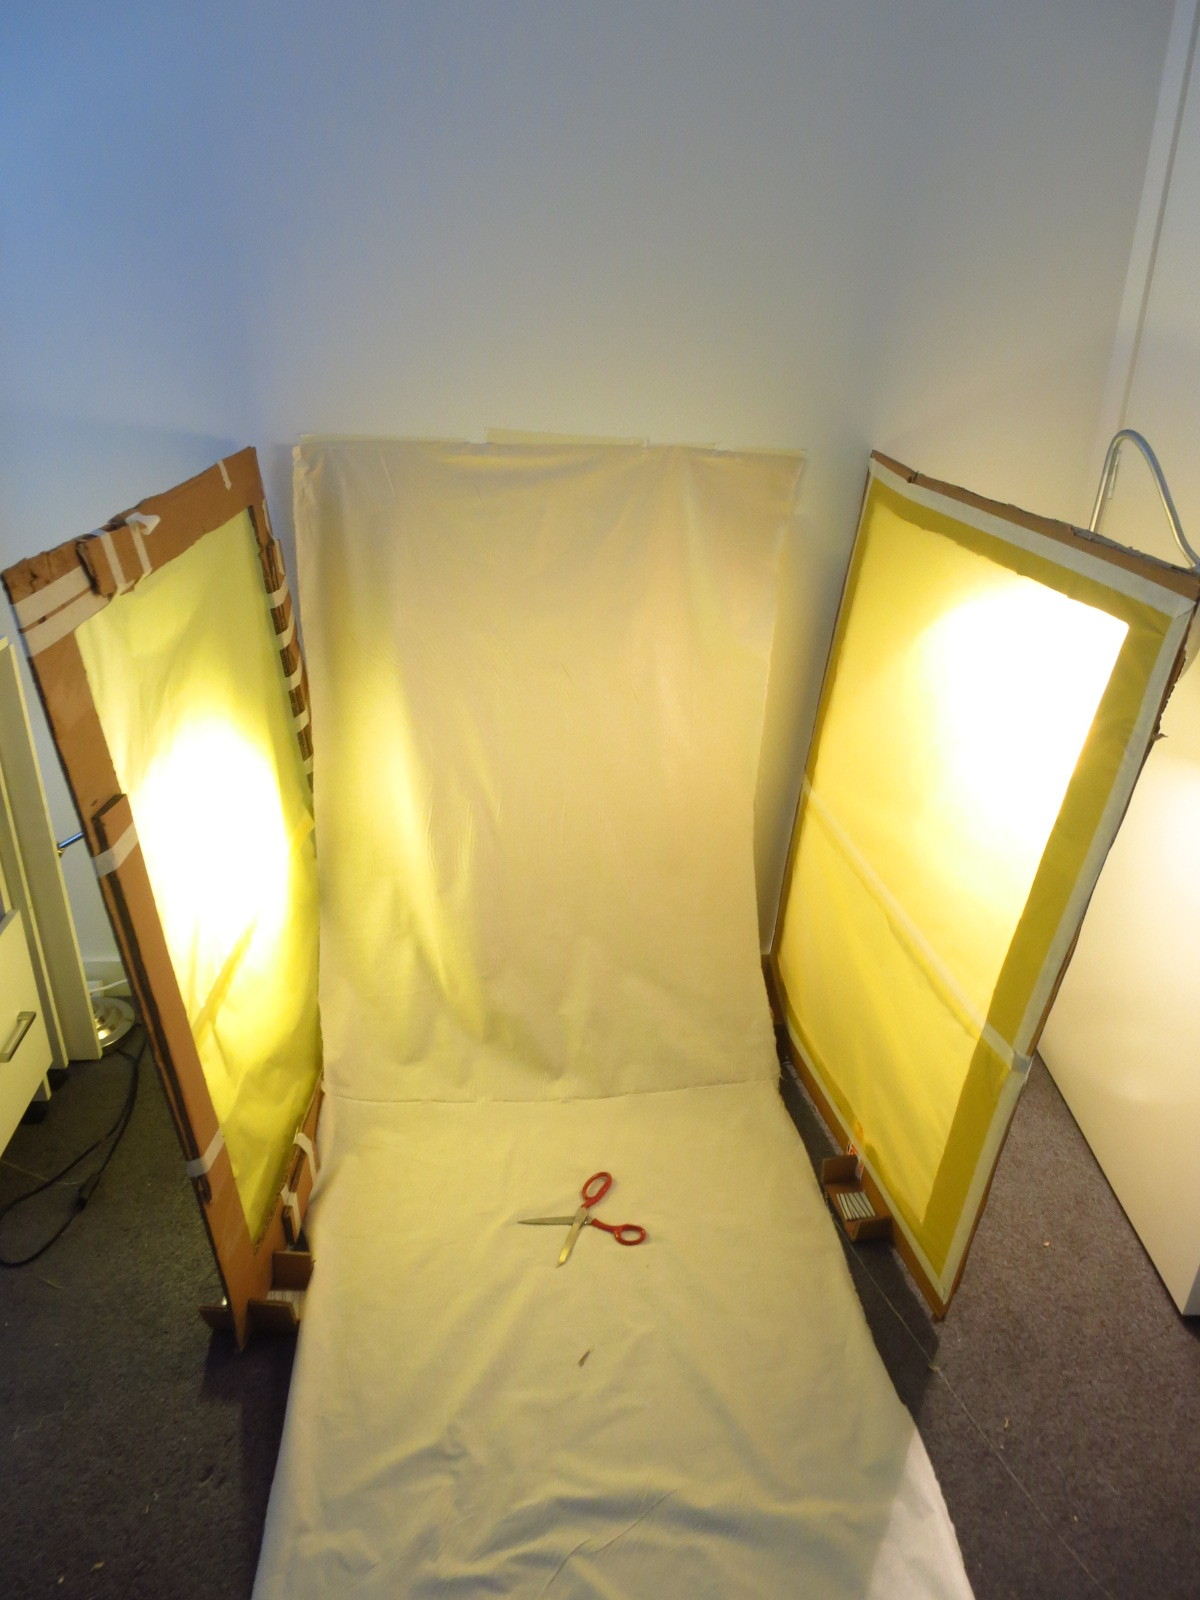 DIY light box, home-made light box for photography